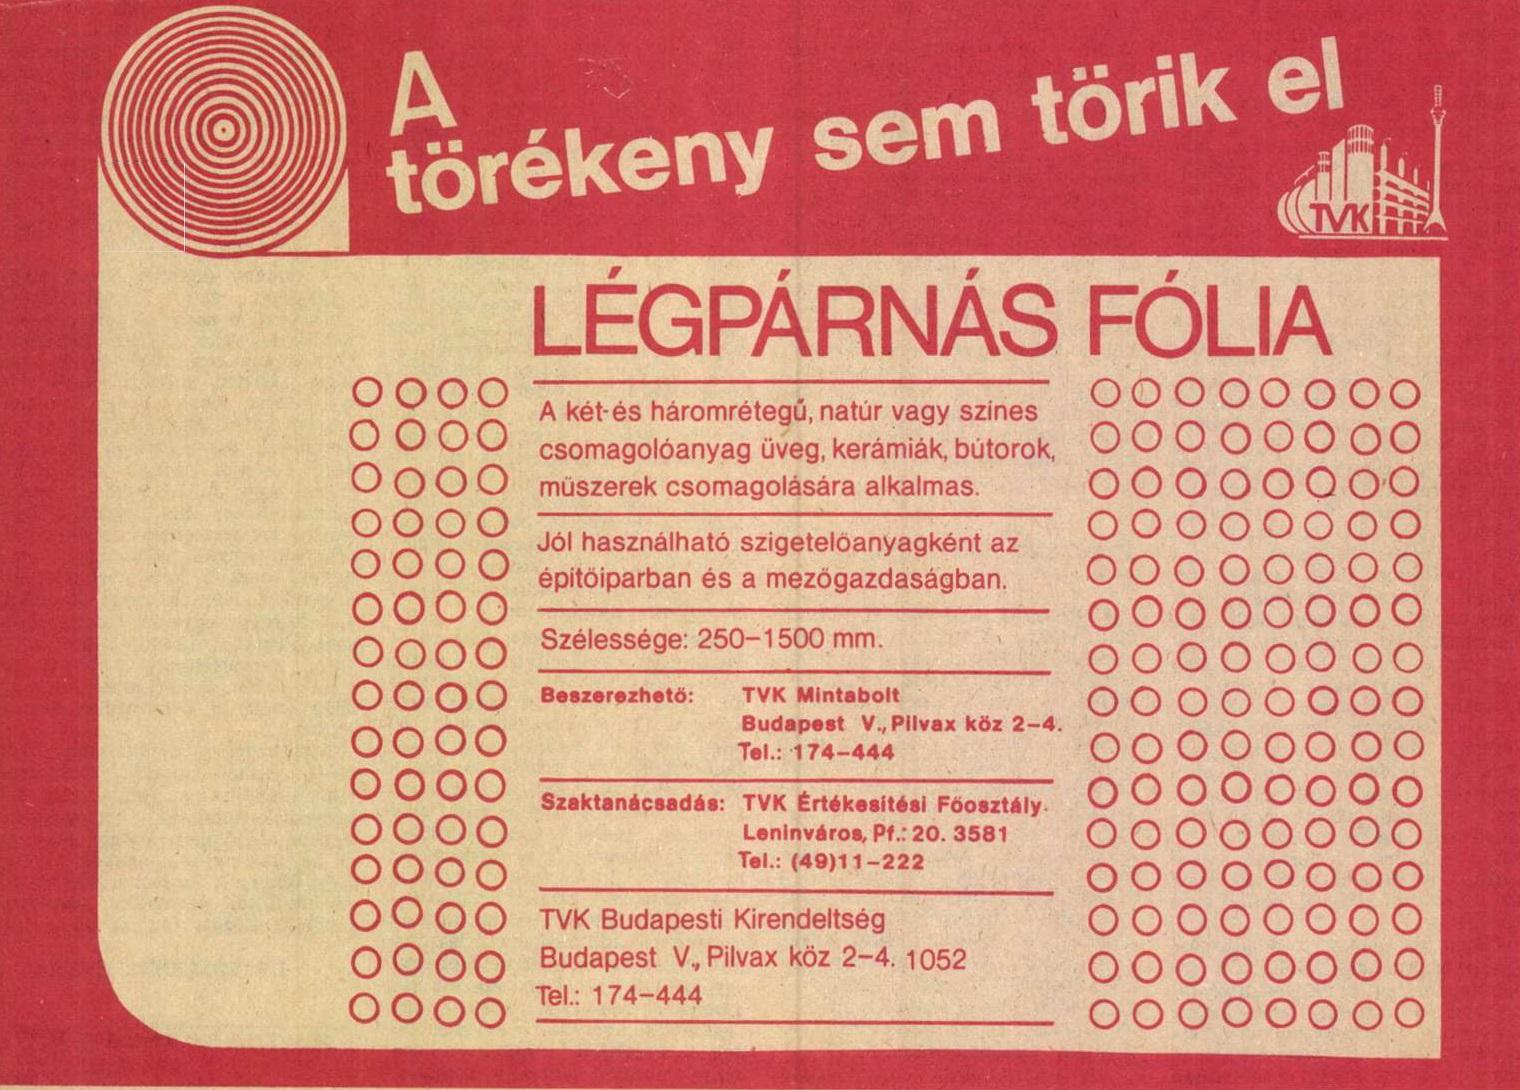 idokapszula_nb_i_1983_84_28_fordulo_reklam_3.jpg